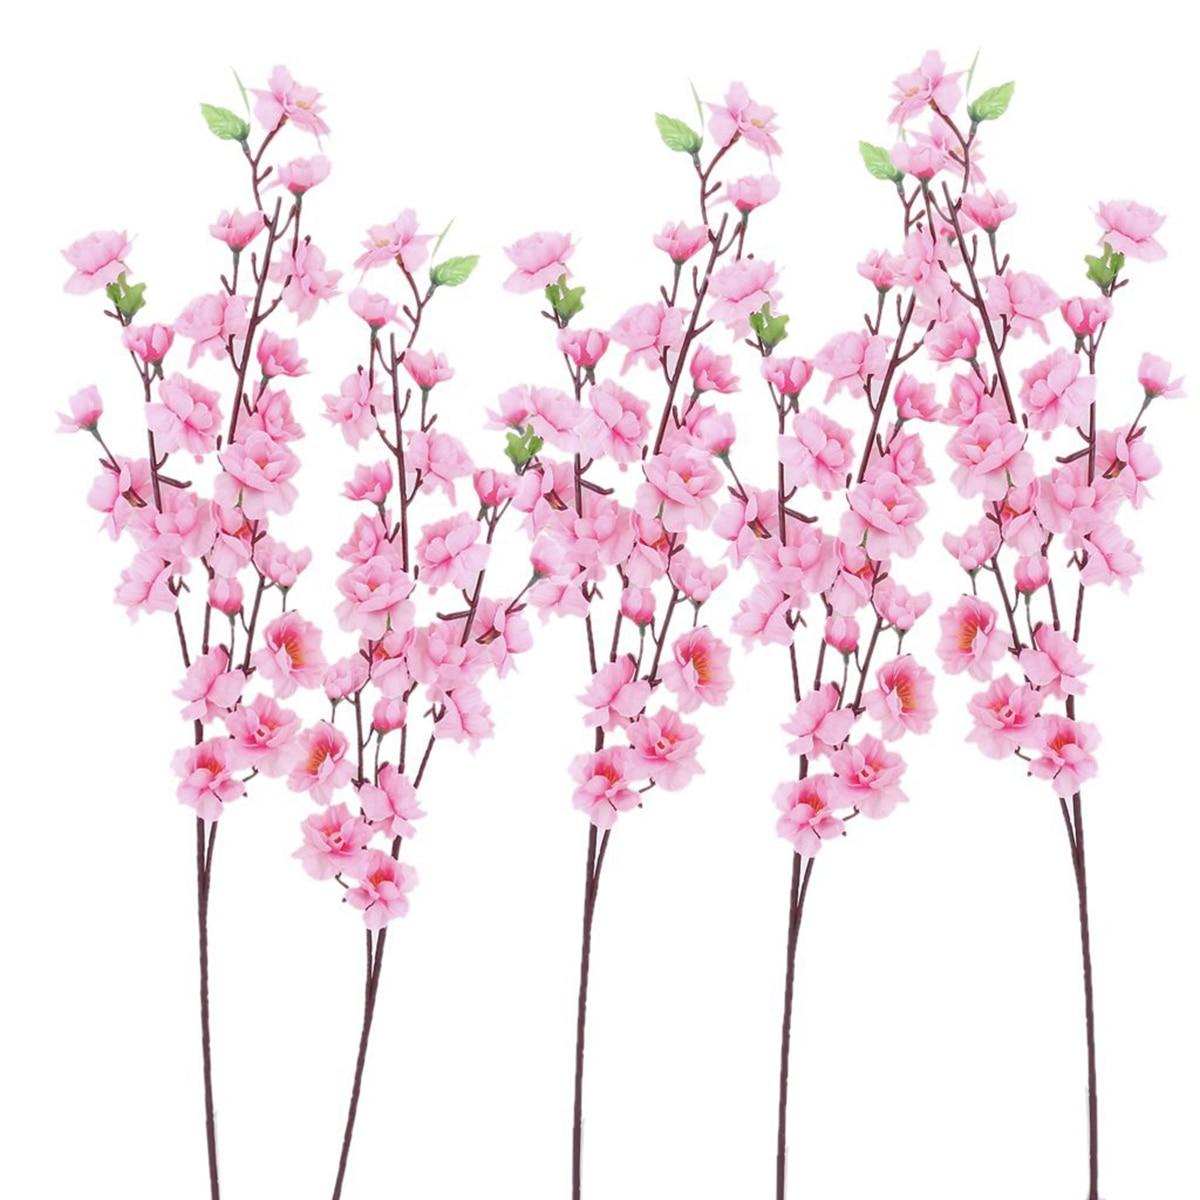 6 pcs Peach Blossom Bunga Simulasi Bunga Buatan Sutra Bunga Dekorasi - Hari libur dan pesta